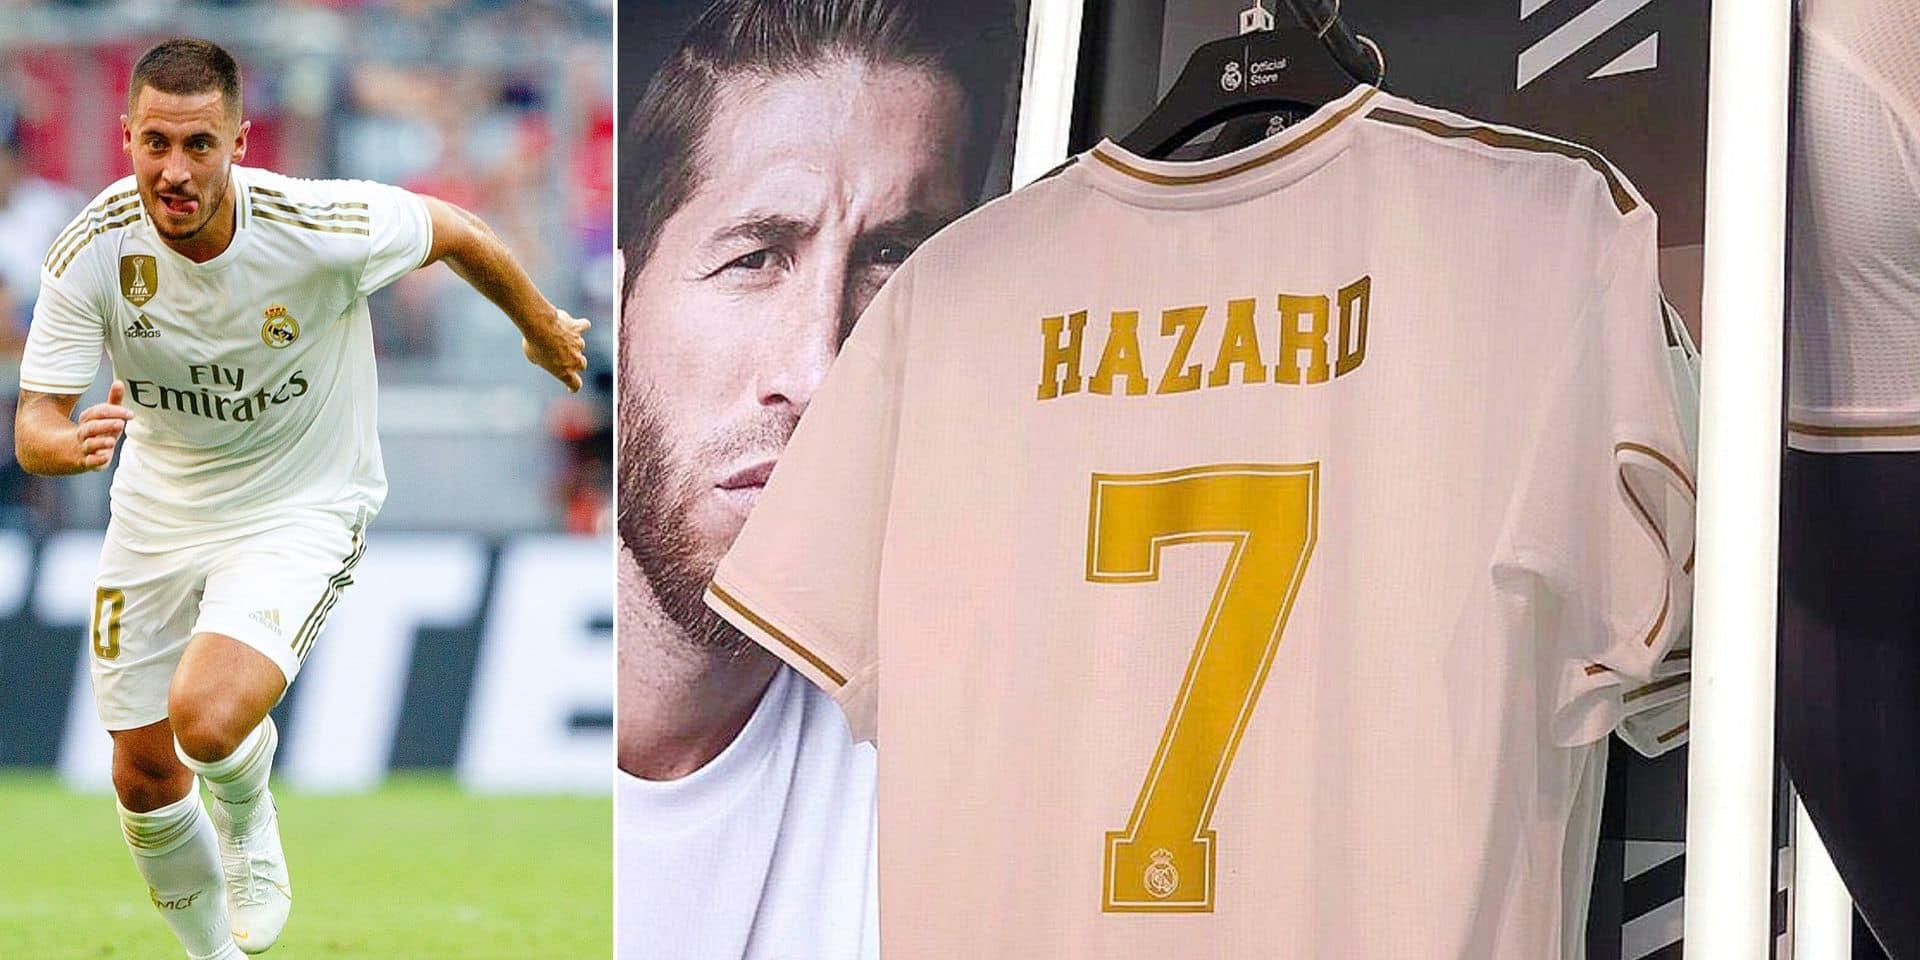 Hazard numéro 7 : l'héritage des Kopa, Ronaldo et Raùl